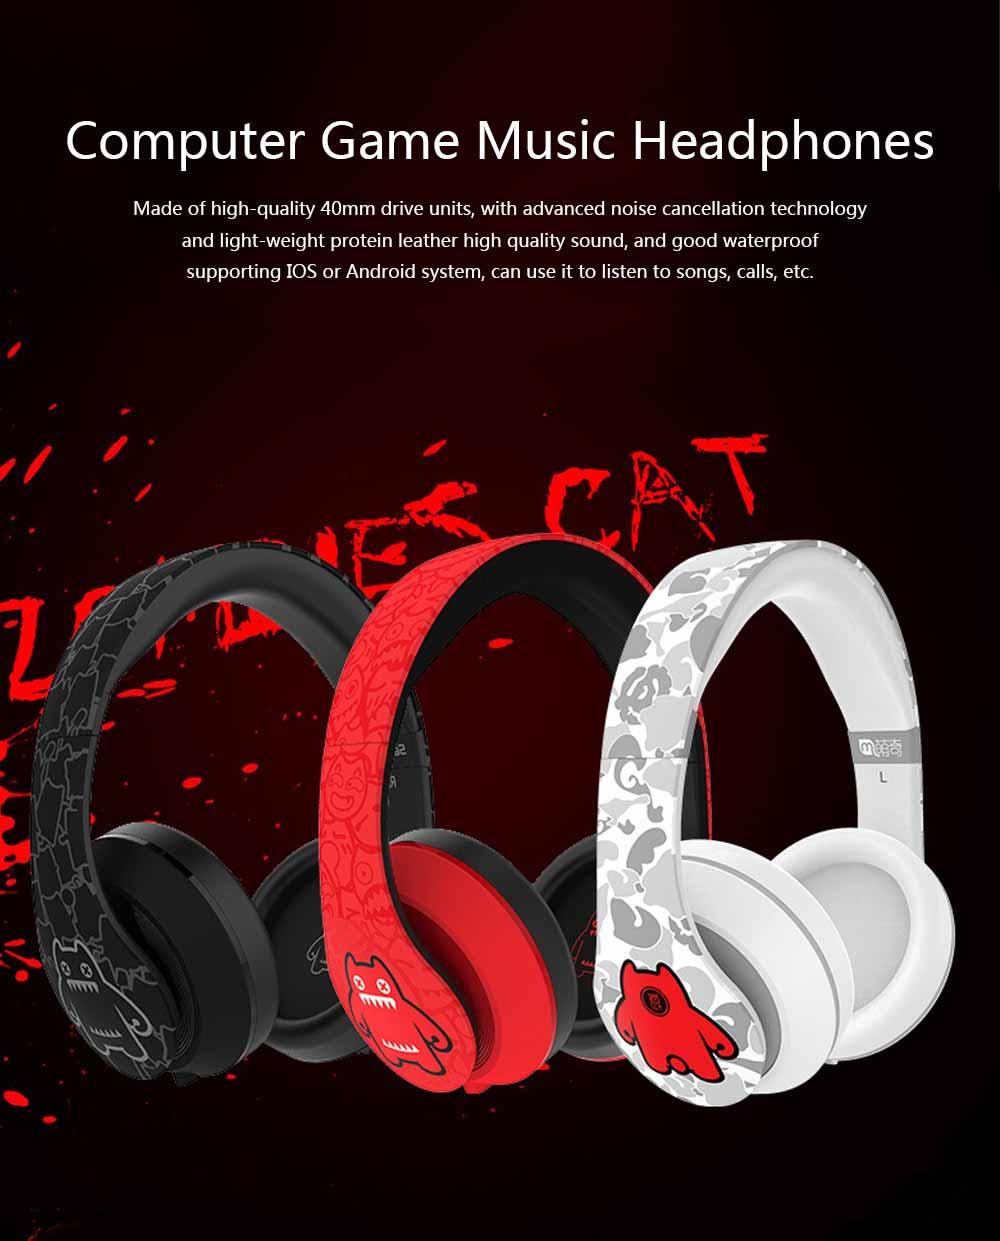 Devil Cat Sound Magic Headphones, Computer Game Music Headphones Subwoofer with Microphone, Bluetooth Earphone 0